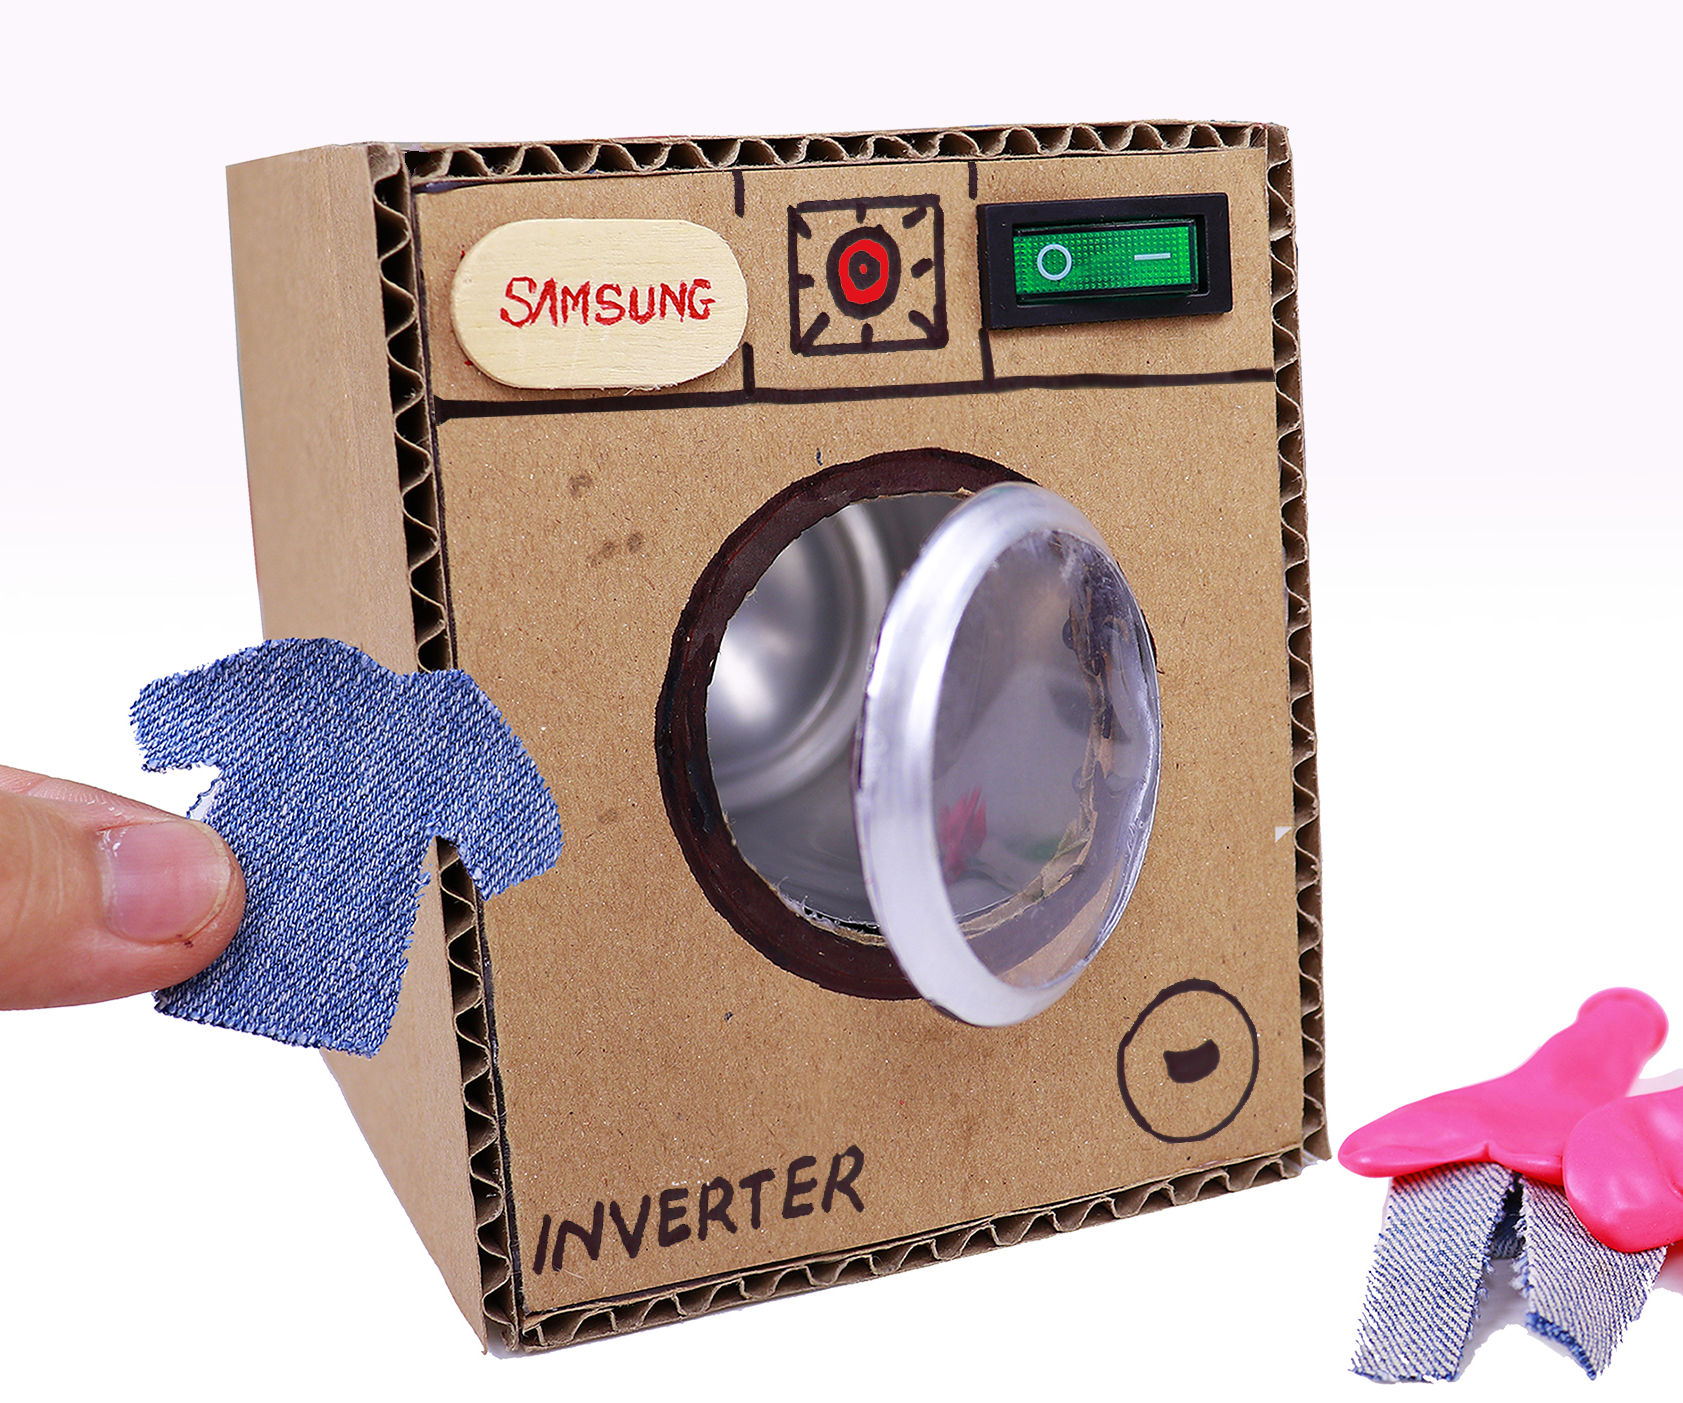 Make Washing Machine From Cardboard